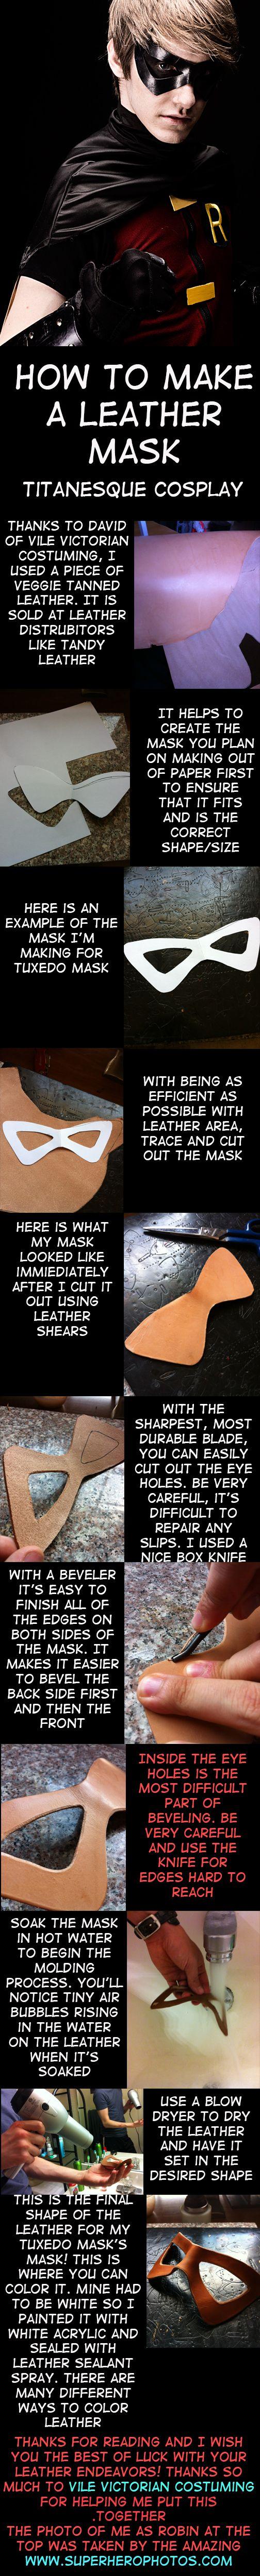 nike air jordan retro 11 low price Leather Mask Tutorial by TitanesqueCosplay deviantart com on  deviantART